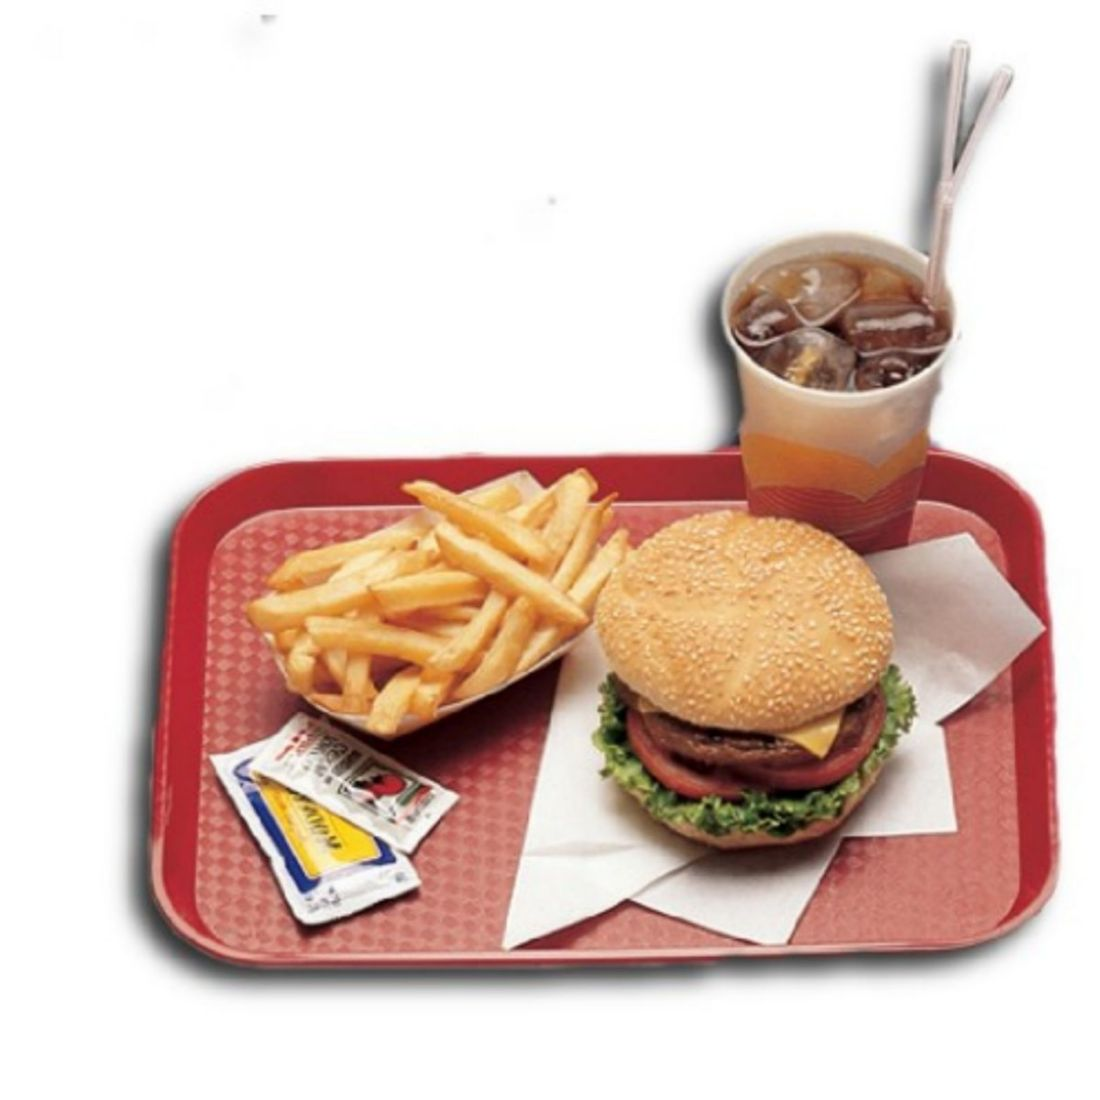 Podnos Fast Food - červený 300 x 410 mm